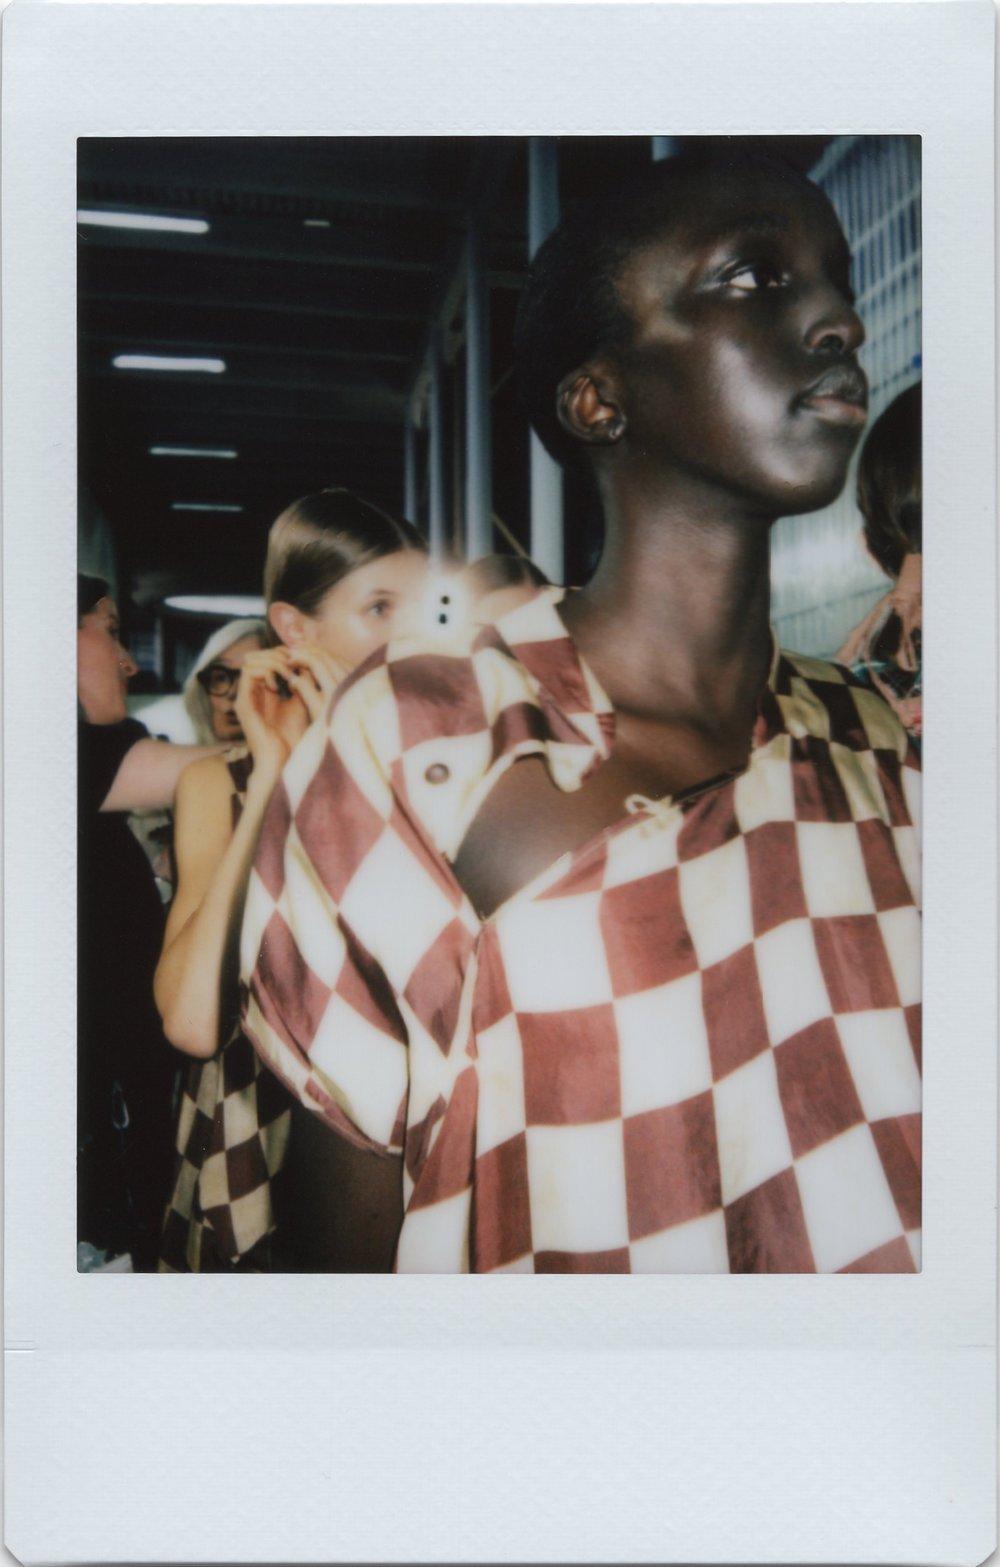 UmaWang_Honigschreck_Polaroid_4.jpg